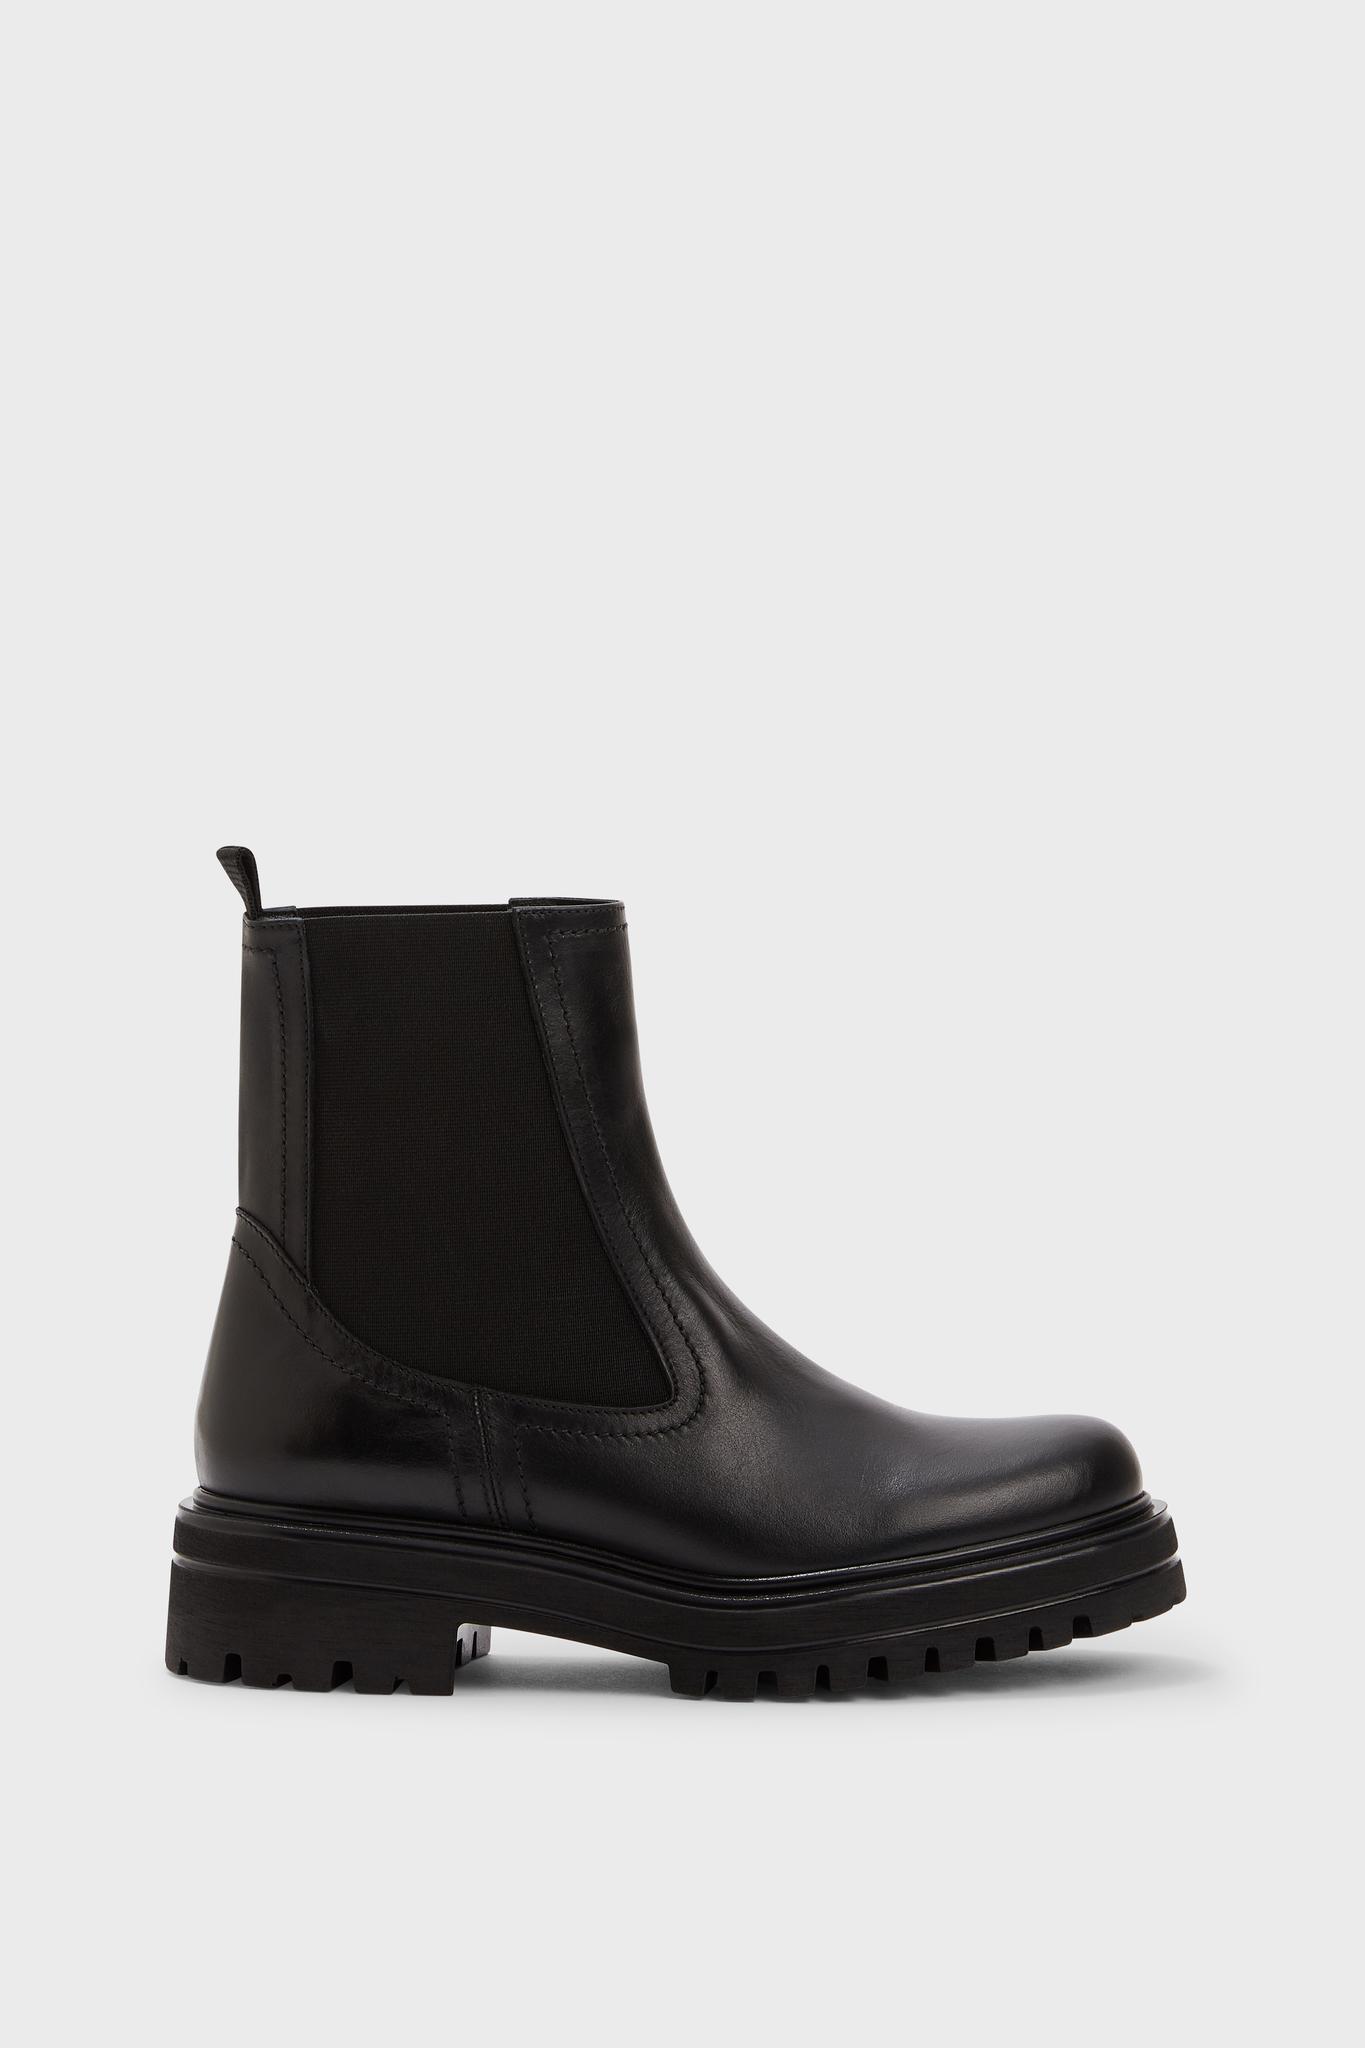 WALKER - Ботинки из гладкой кожи